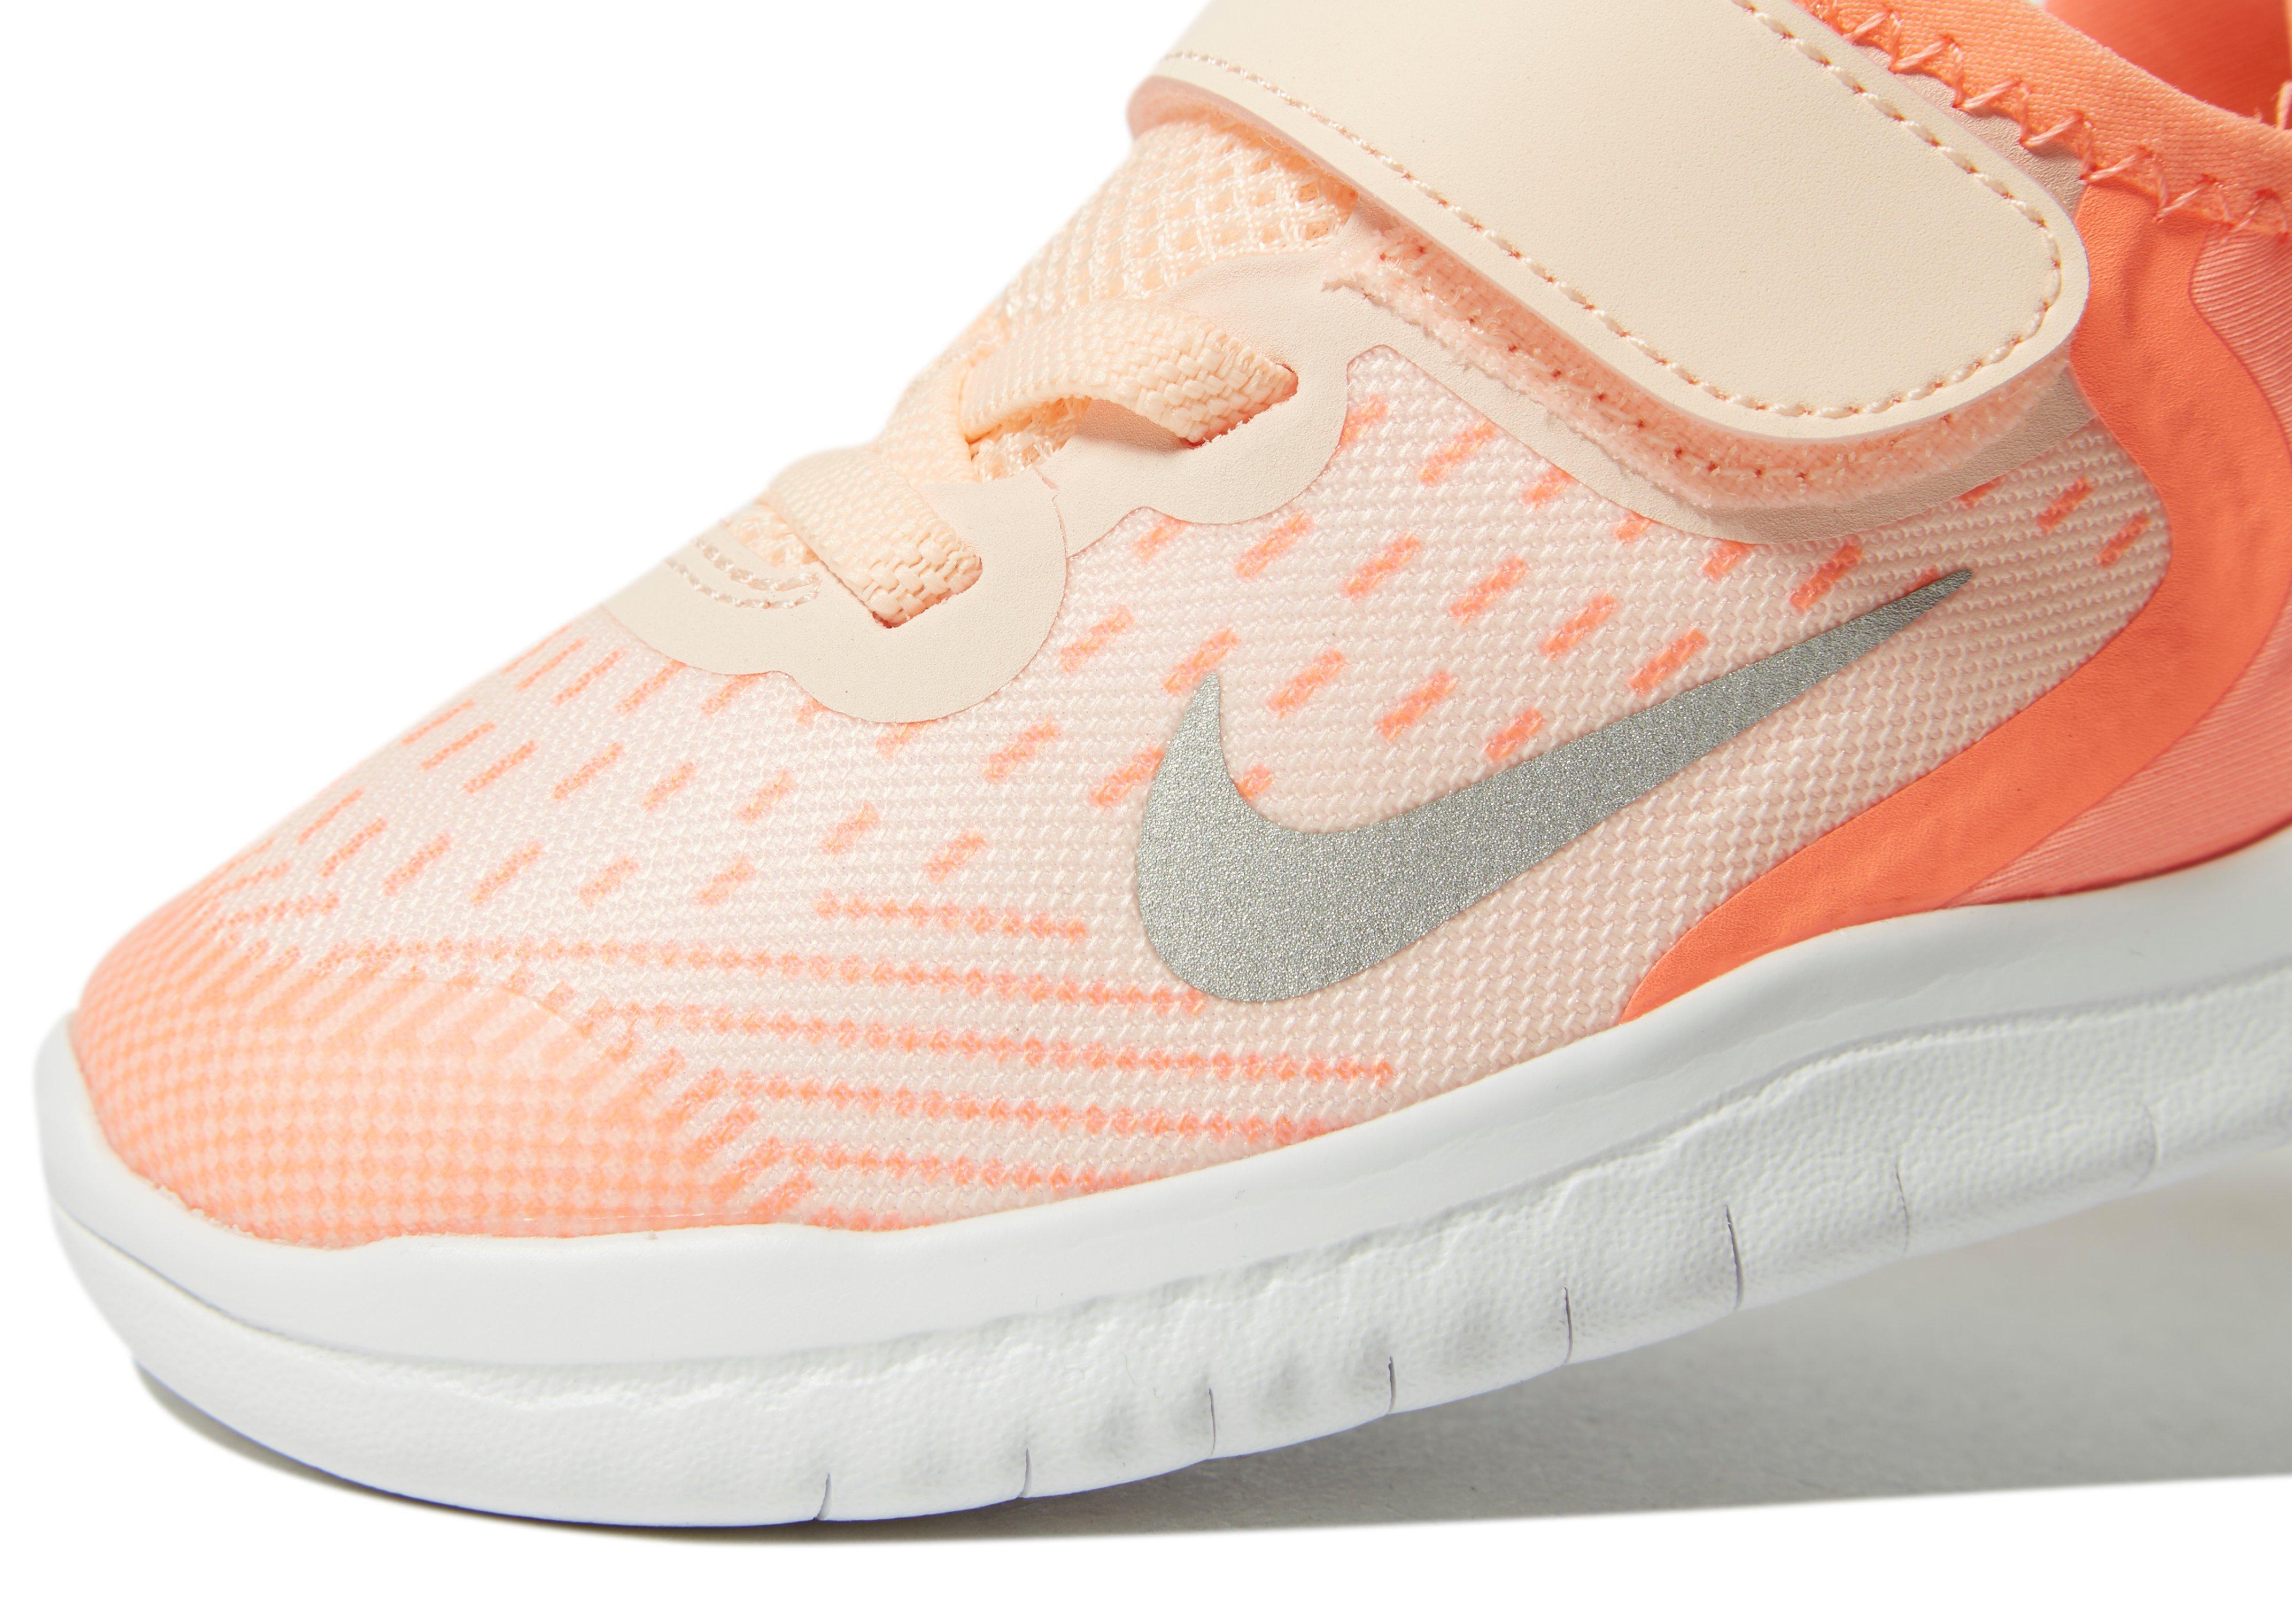 80b79eec163 Qvc Nike Shoes Frees Shoes